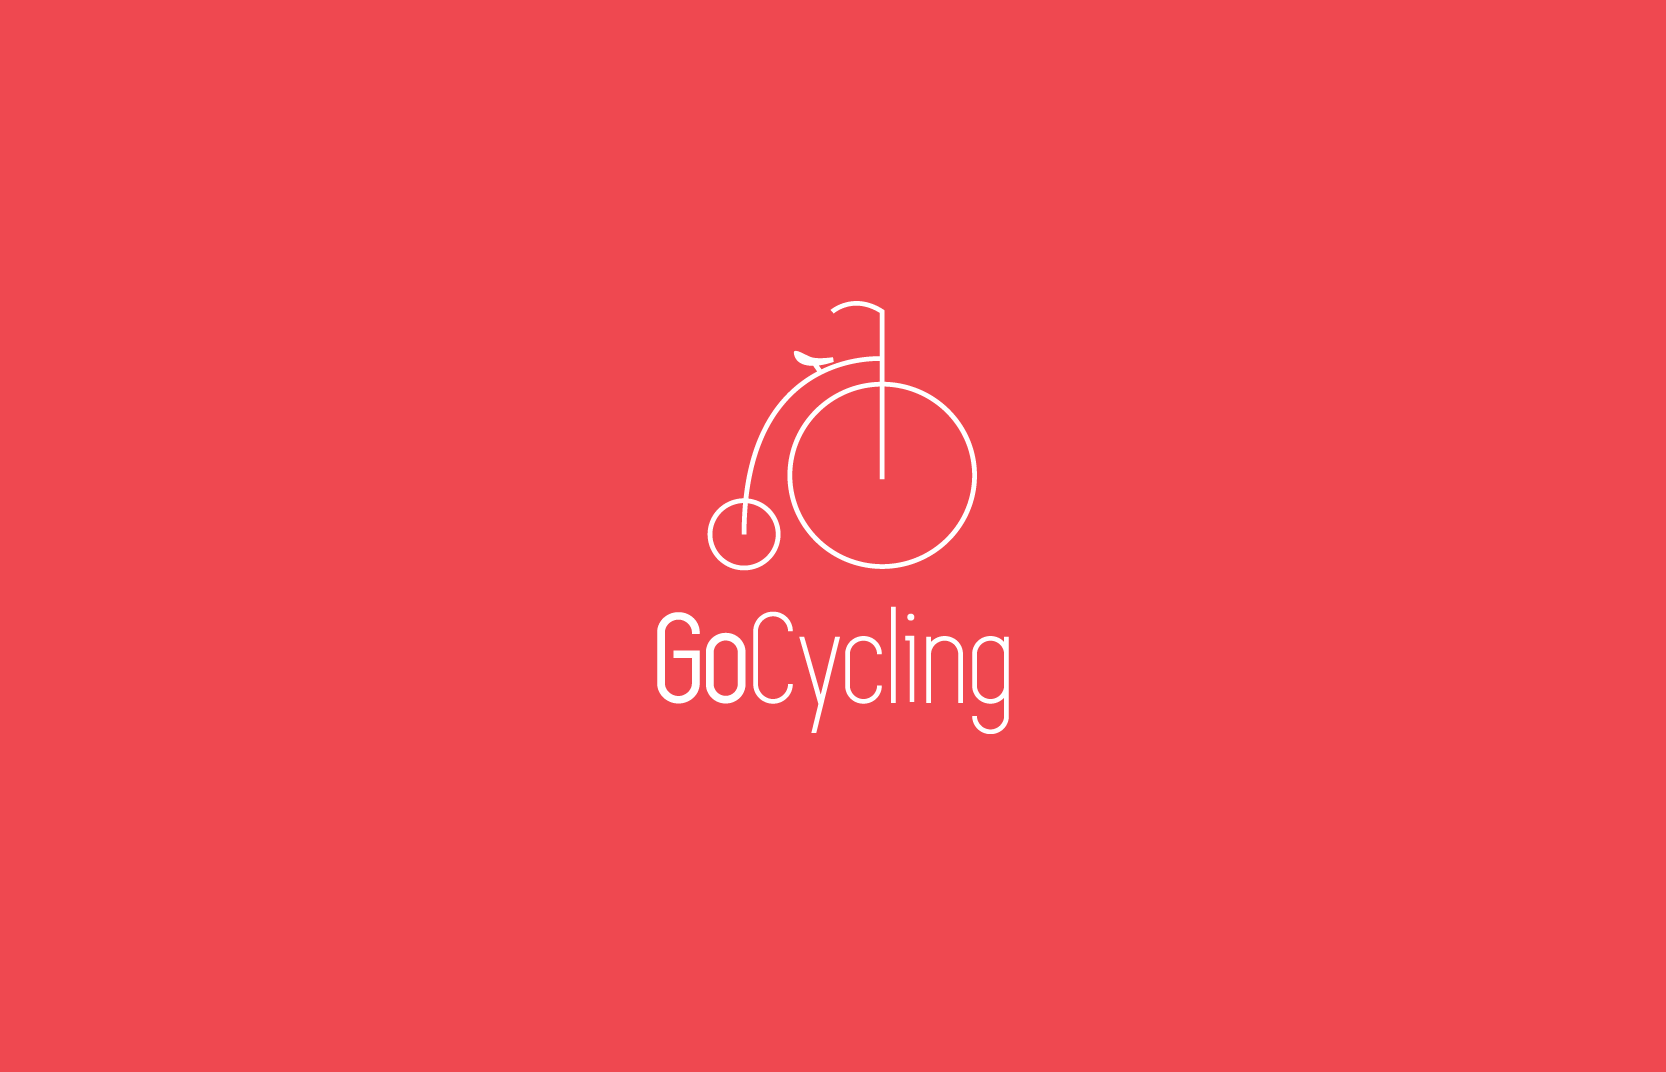 logo_gocycling_logo1